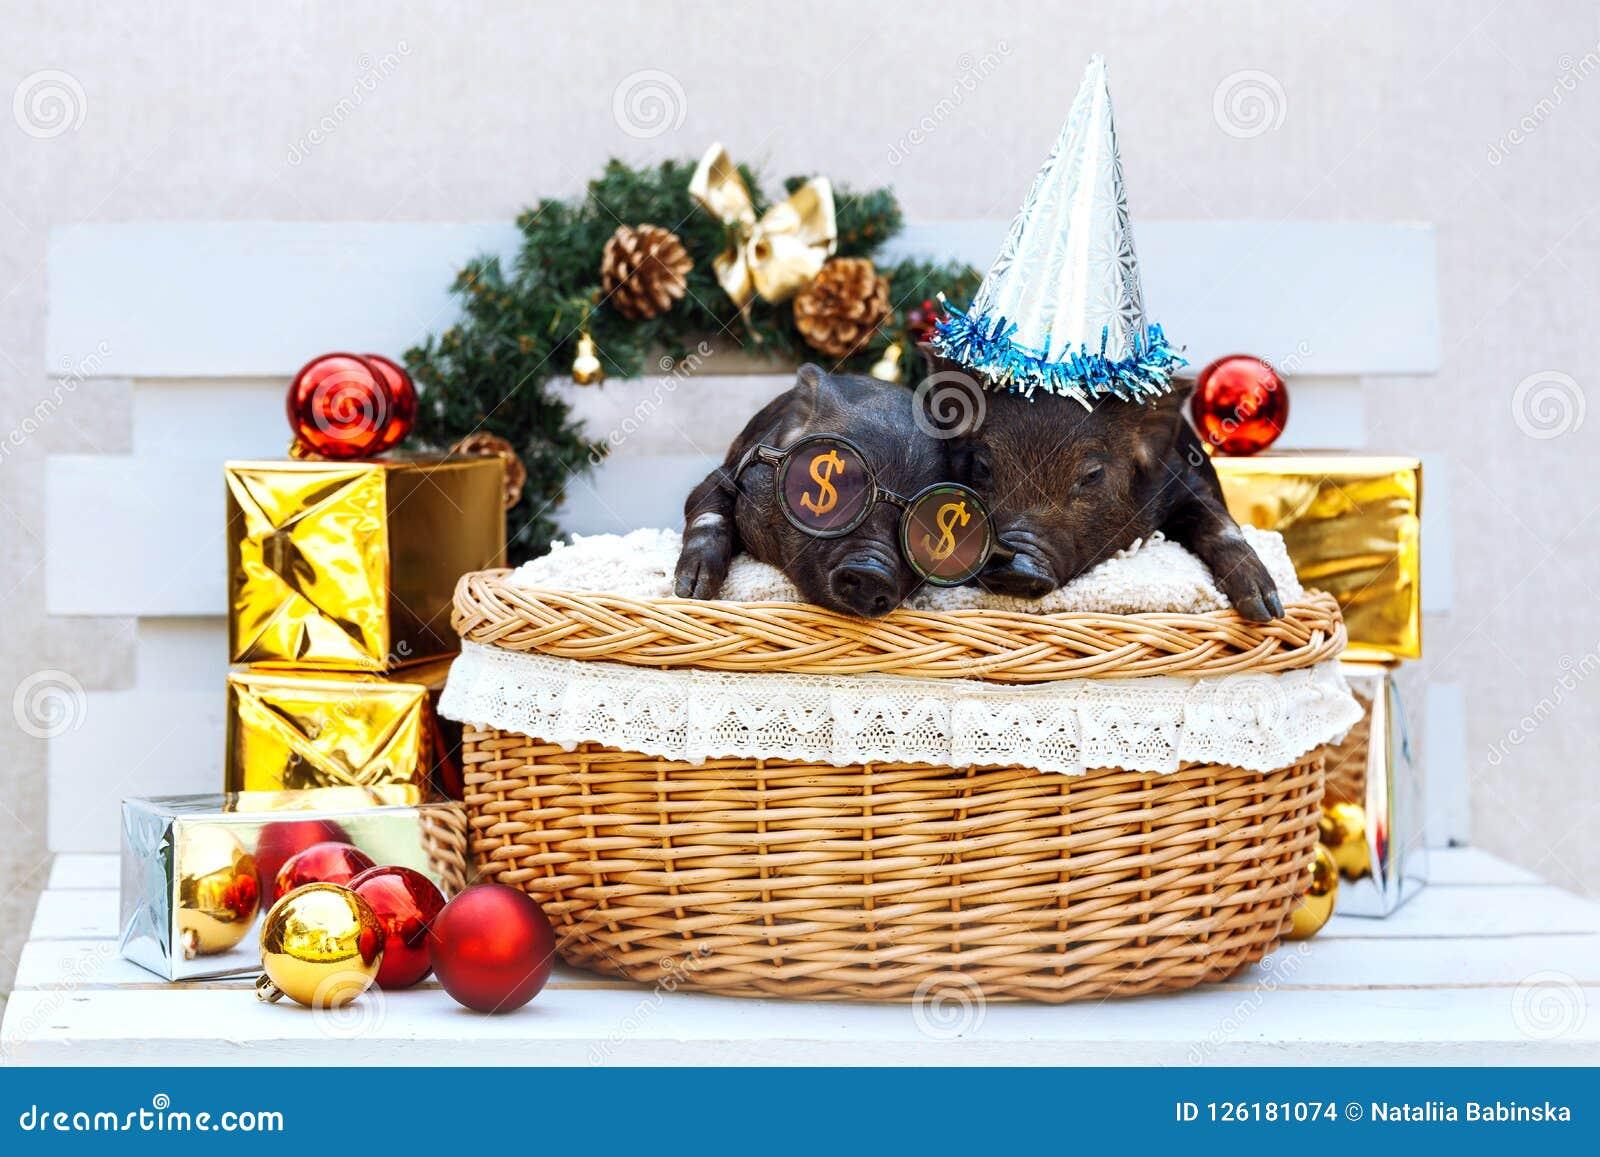 Pig Piglet Little Black Basket Wicker Cute Vietnamese ...